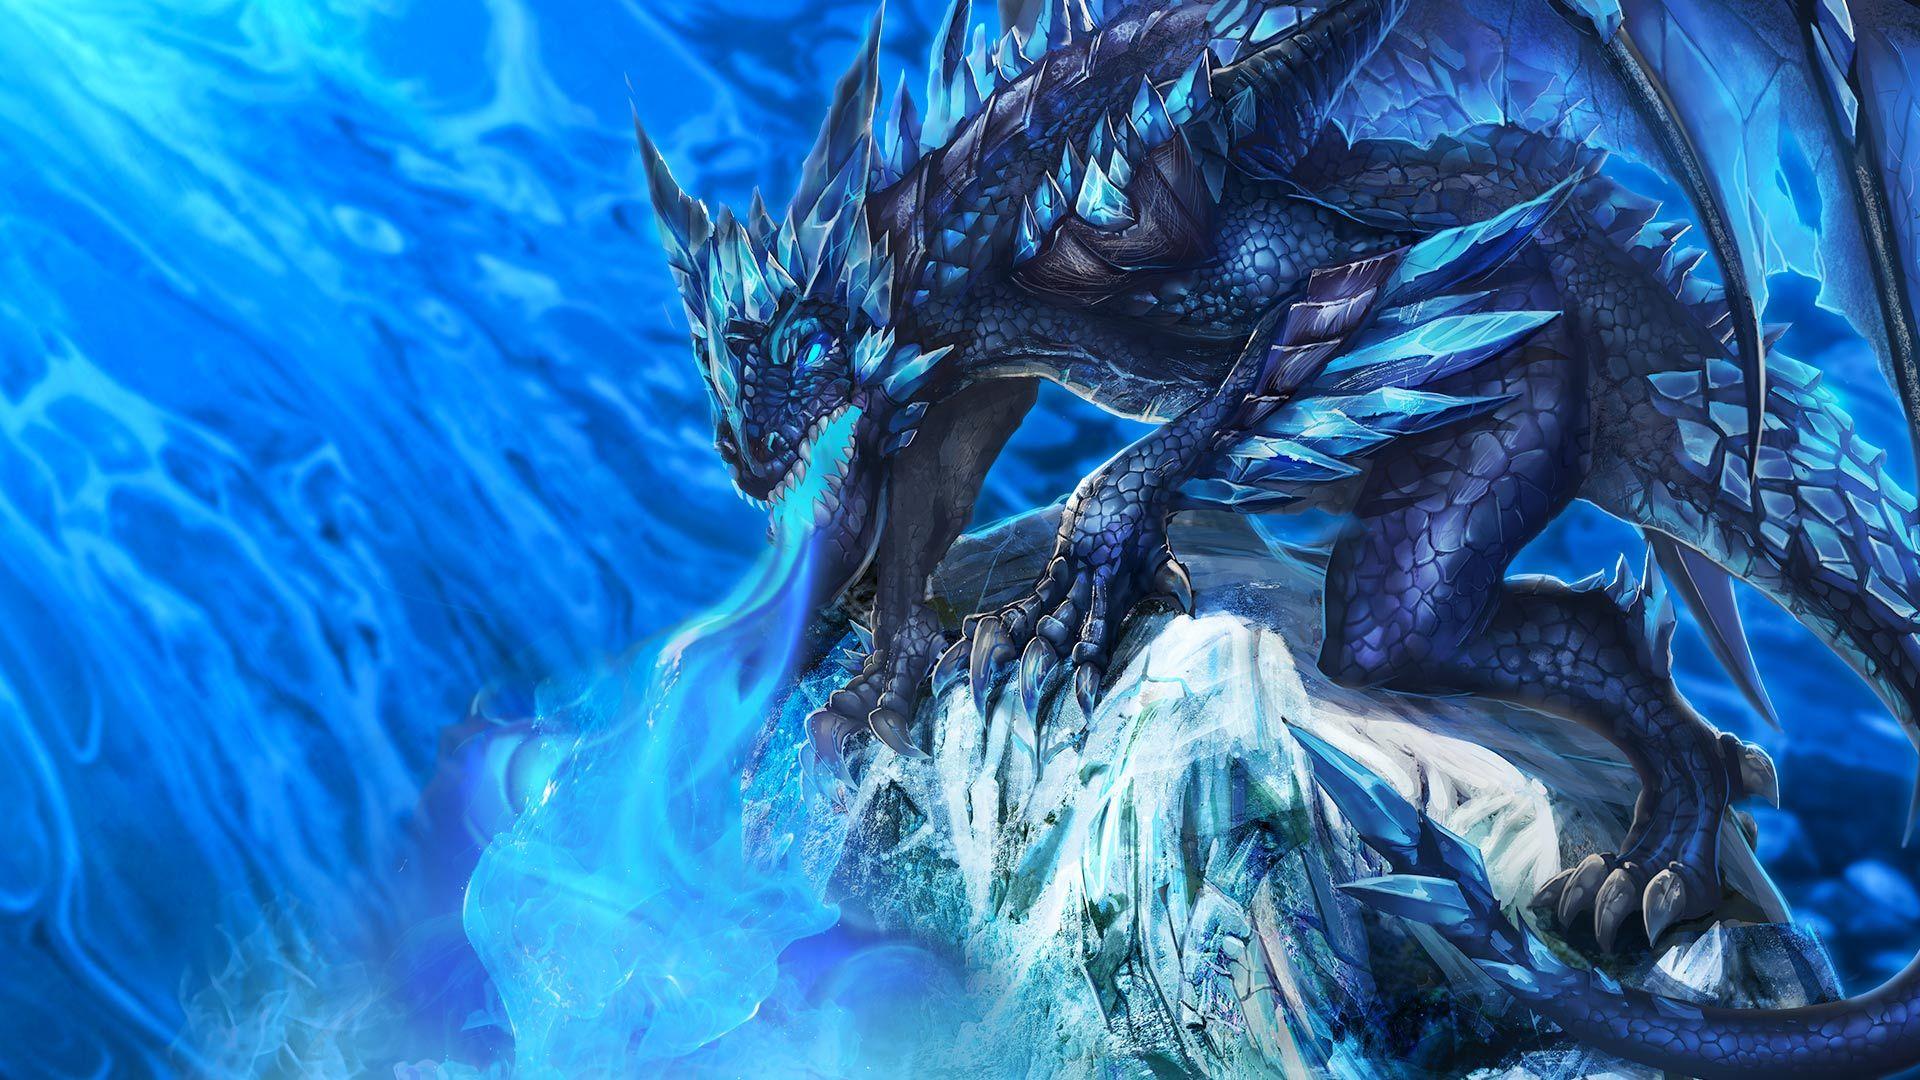 23 Dragon Hd Wallpapers Wallpaperboat